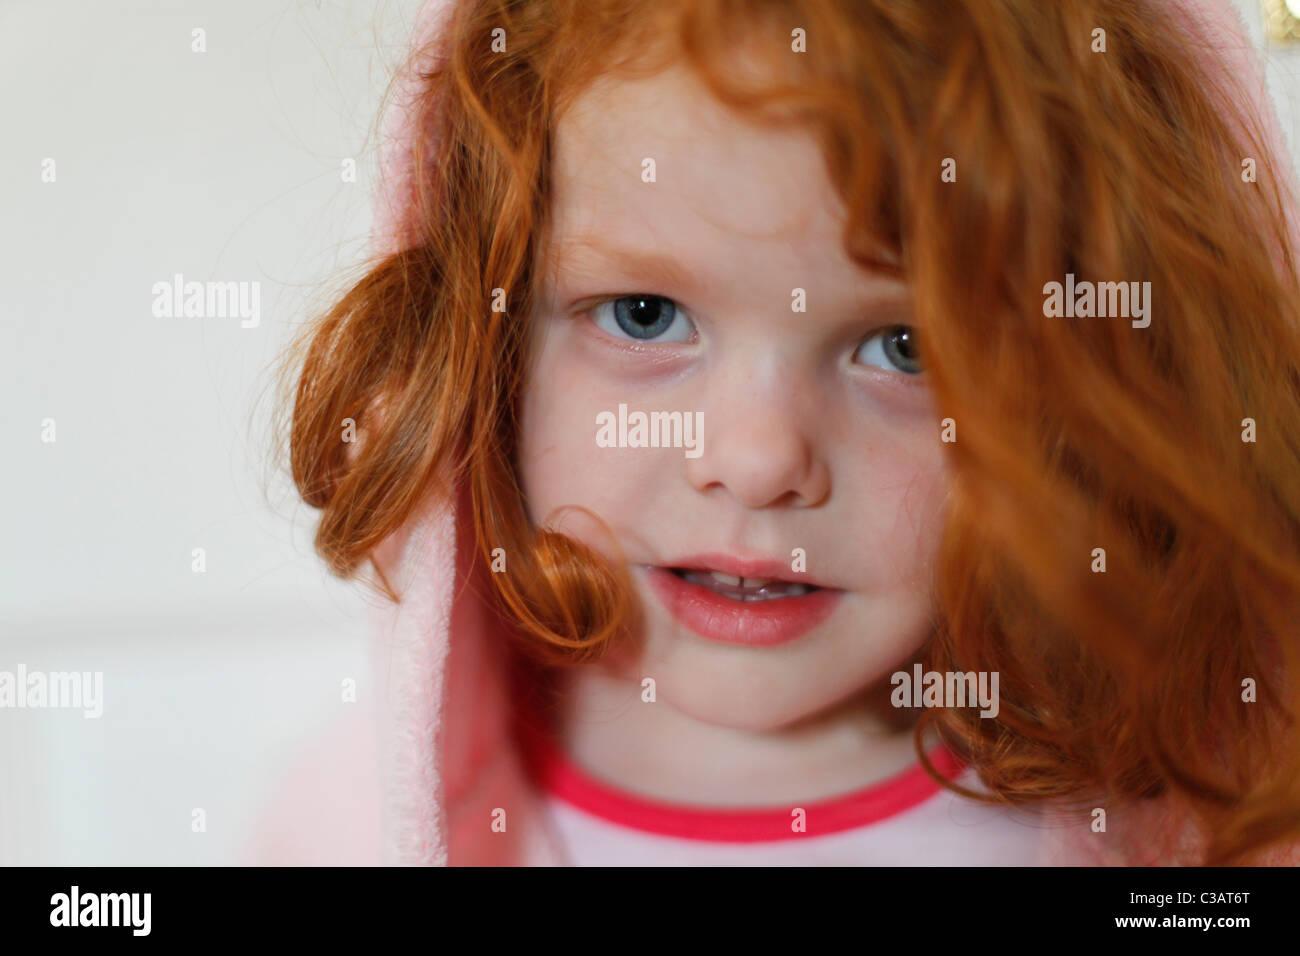 little girl with curly red hair wwwpixsharkcom